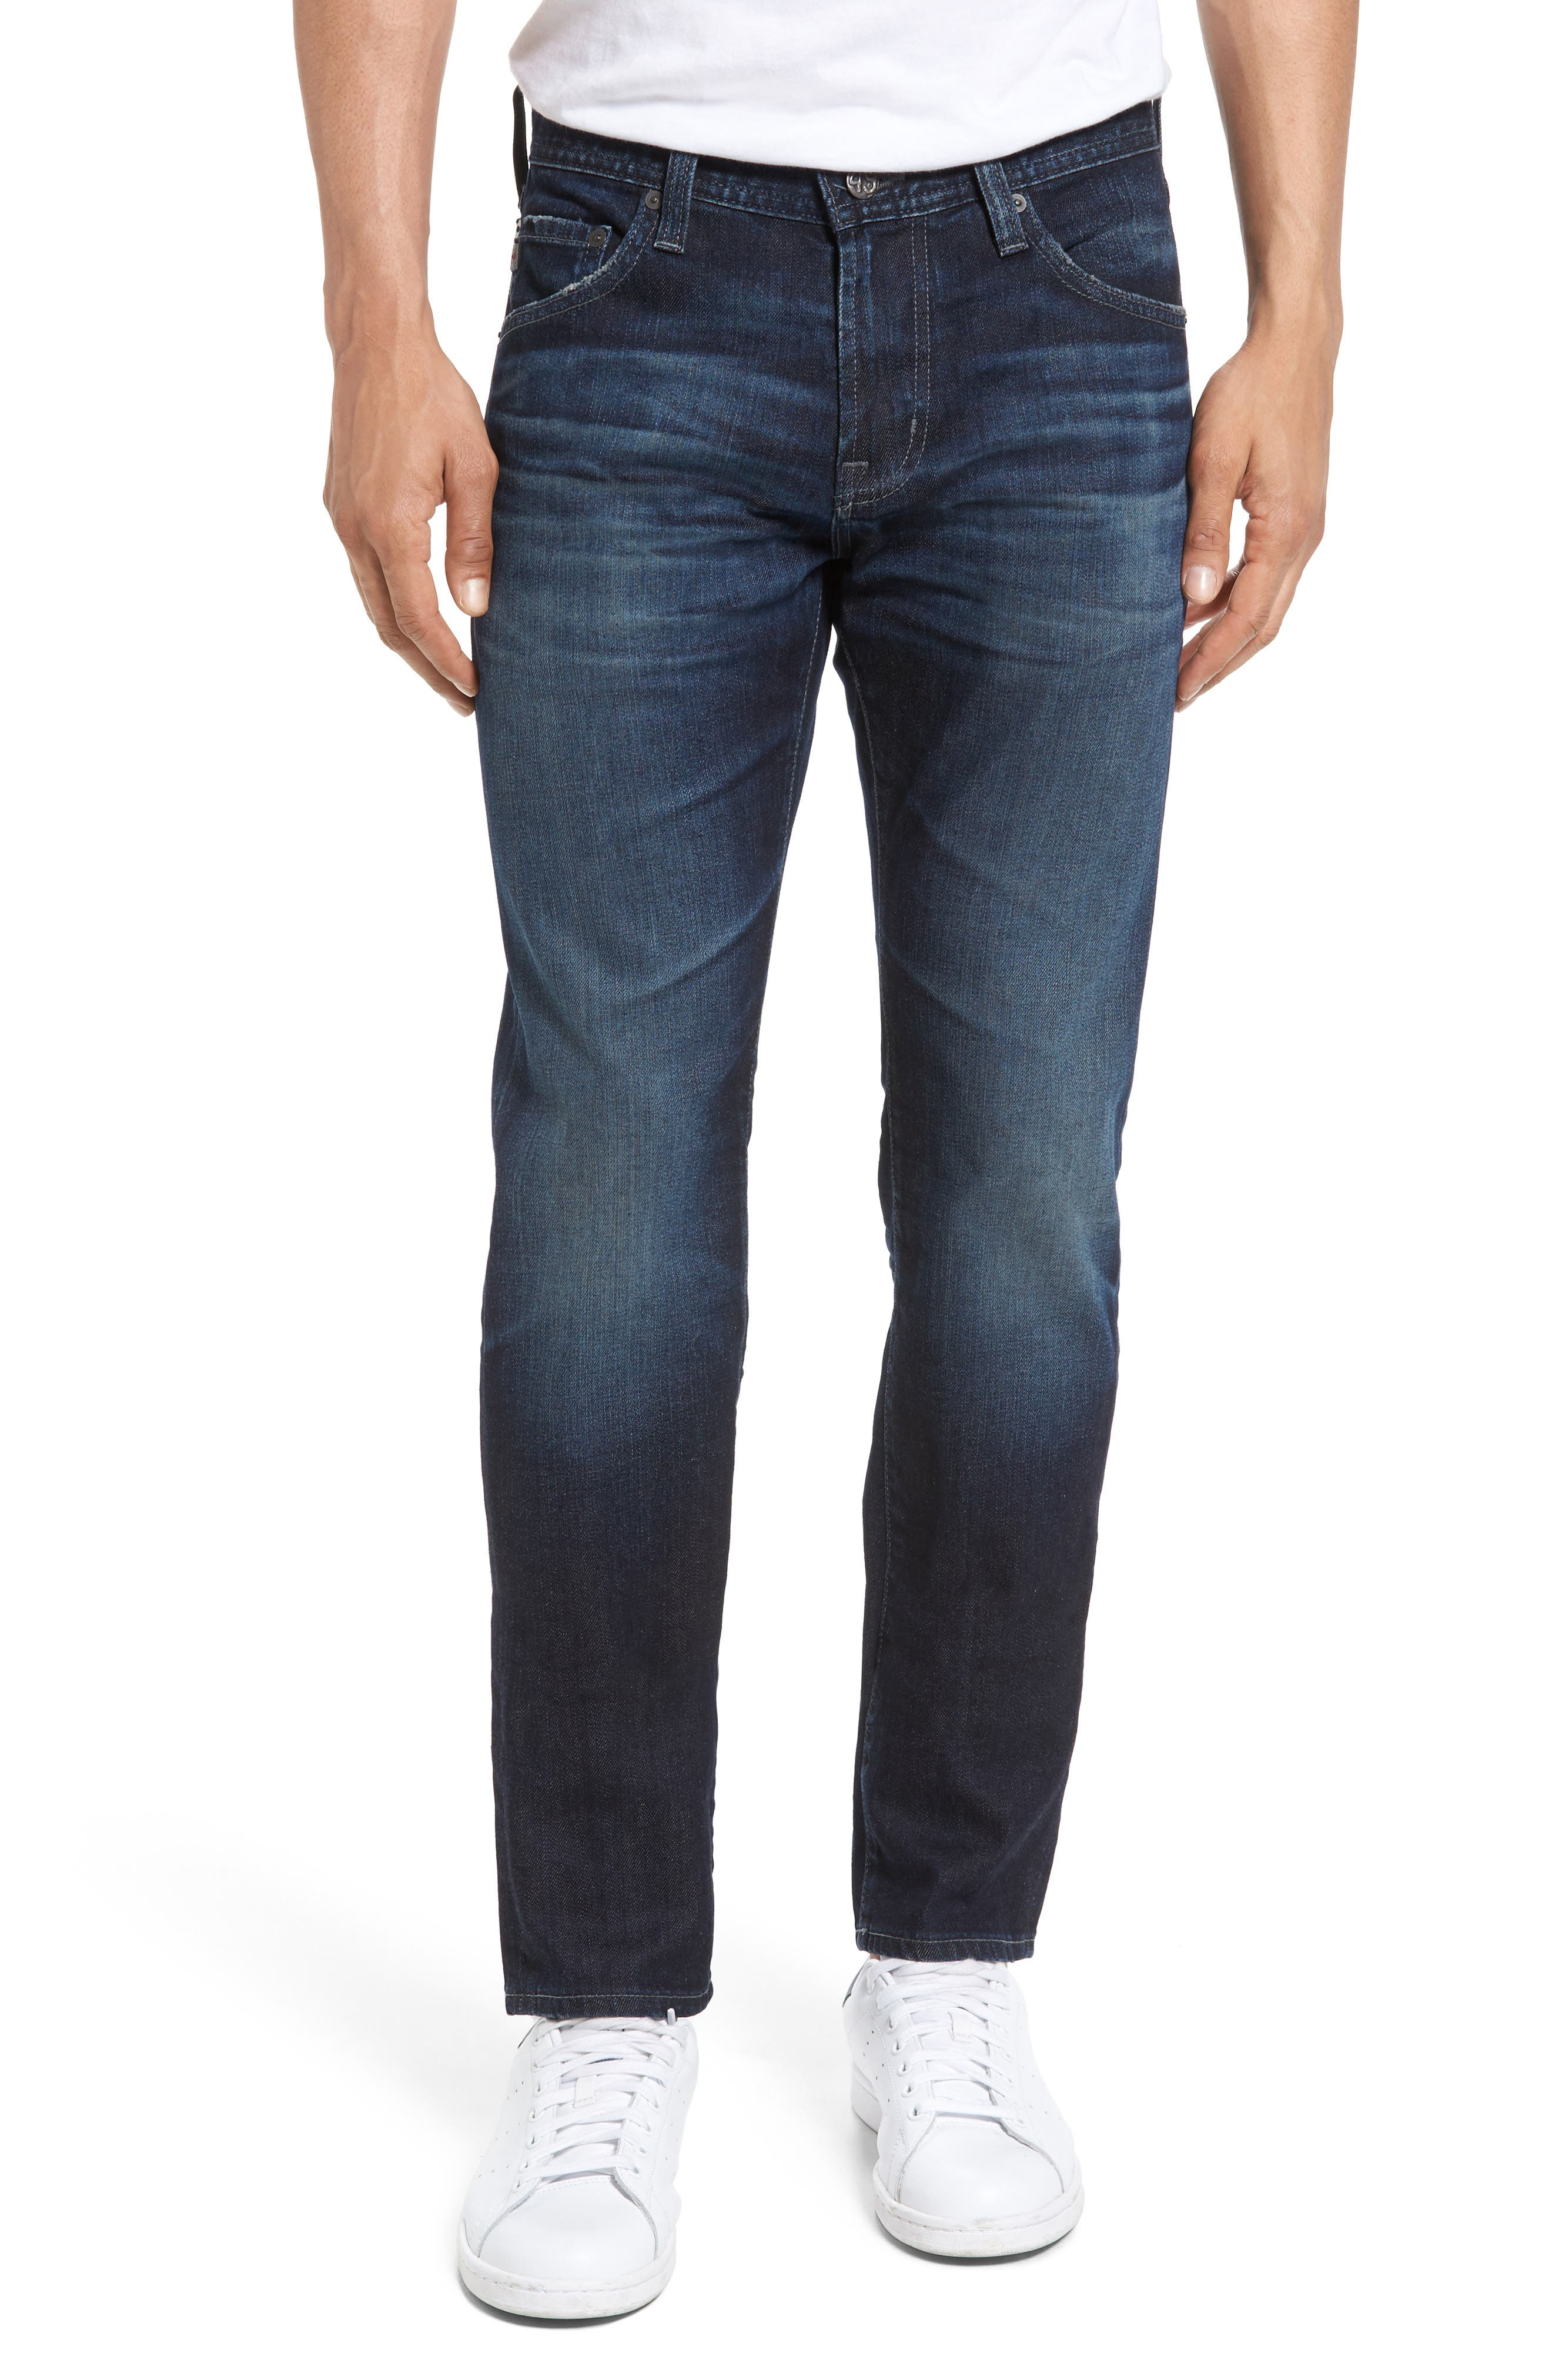 AG Tellis Slim Fit Jeans (4 Years Gone)